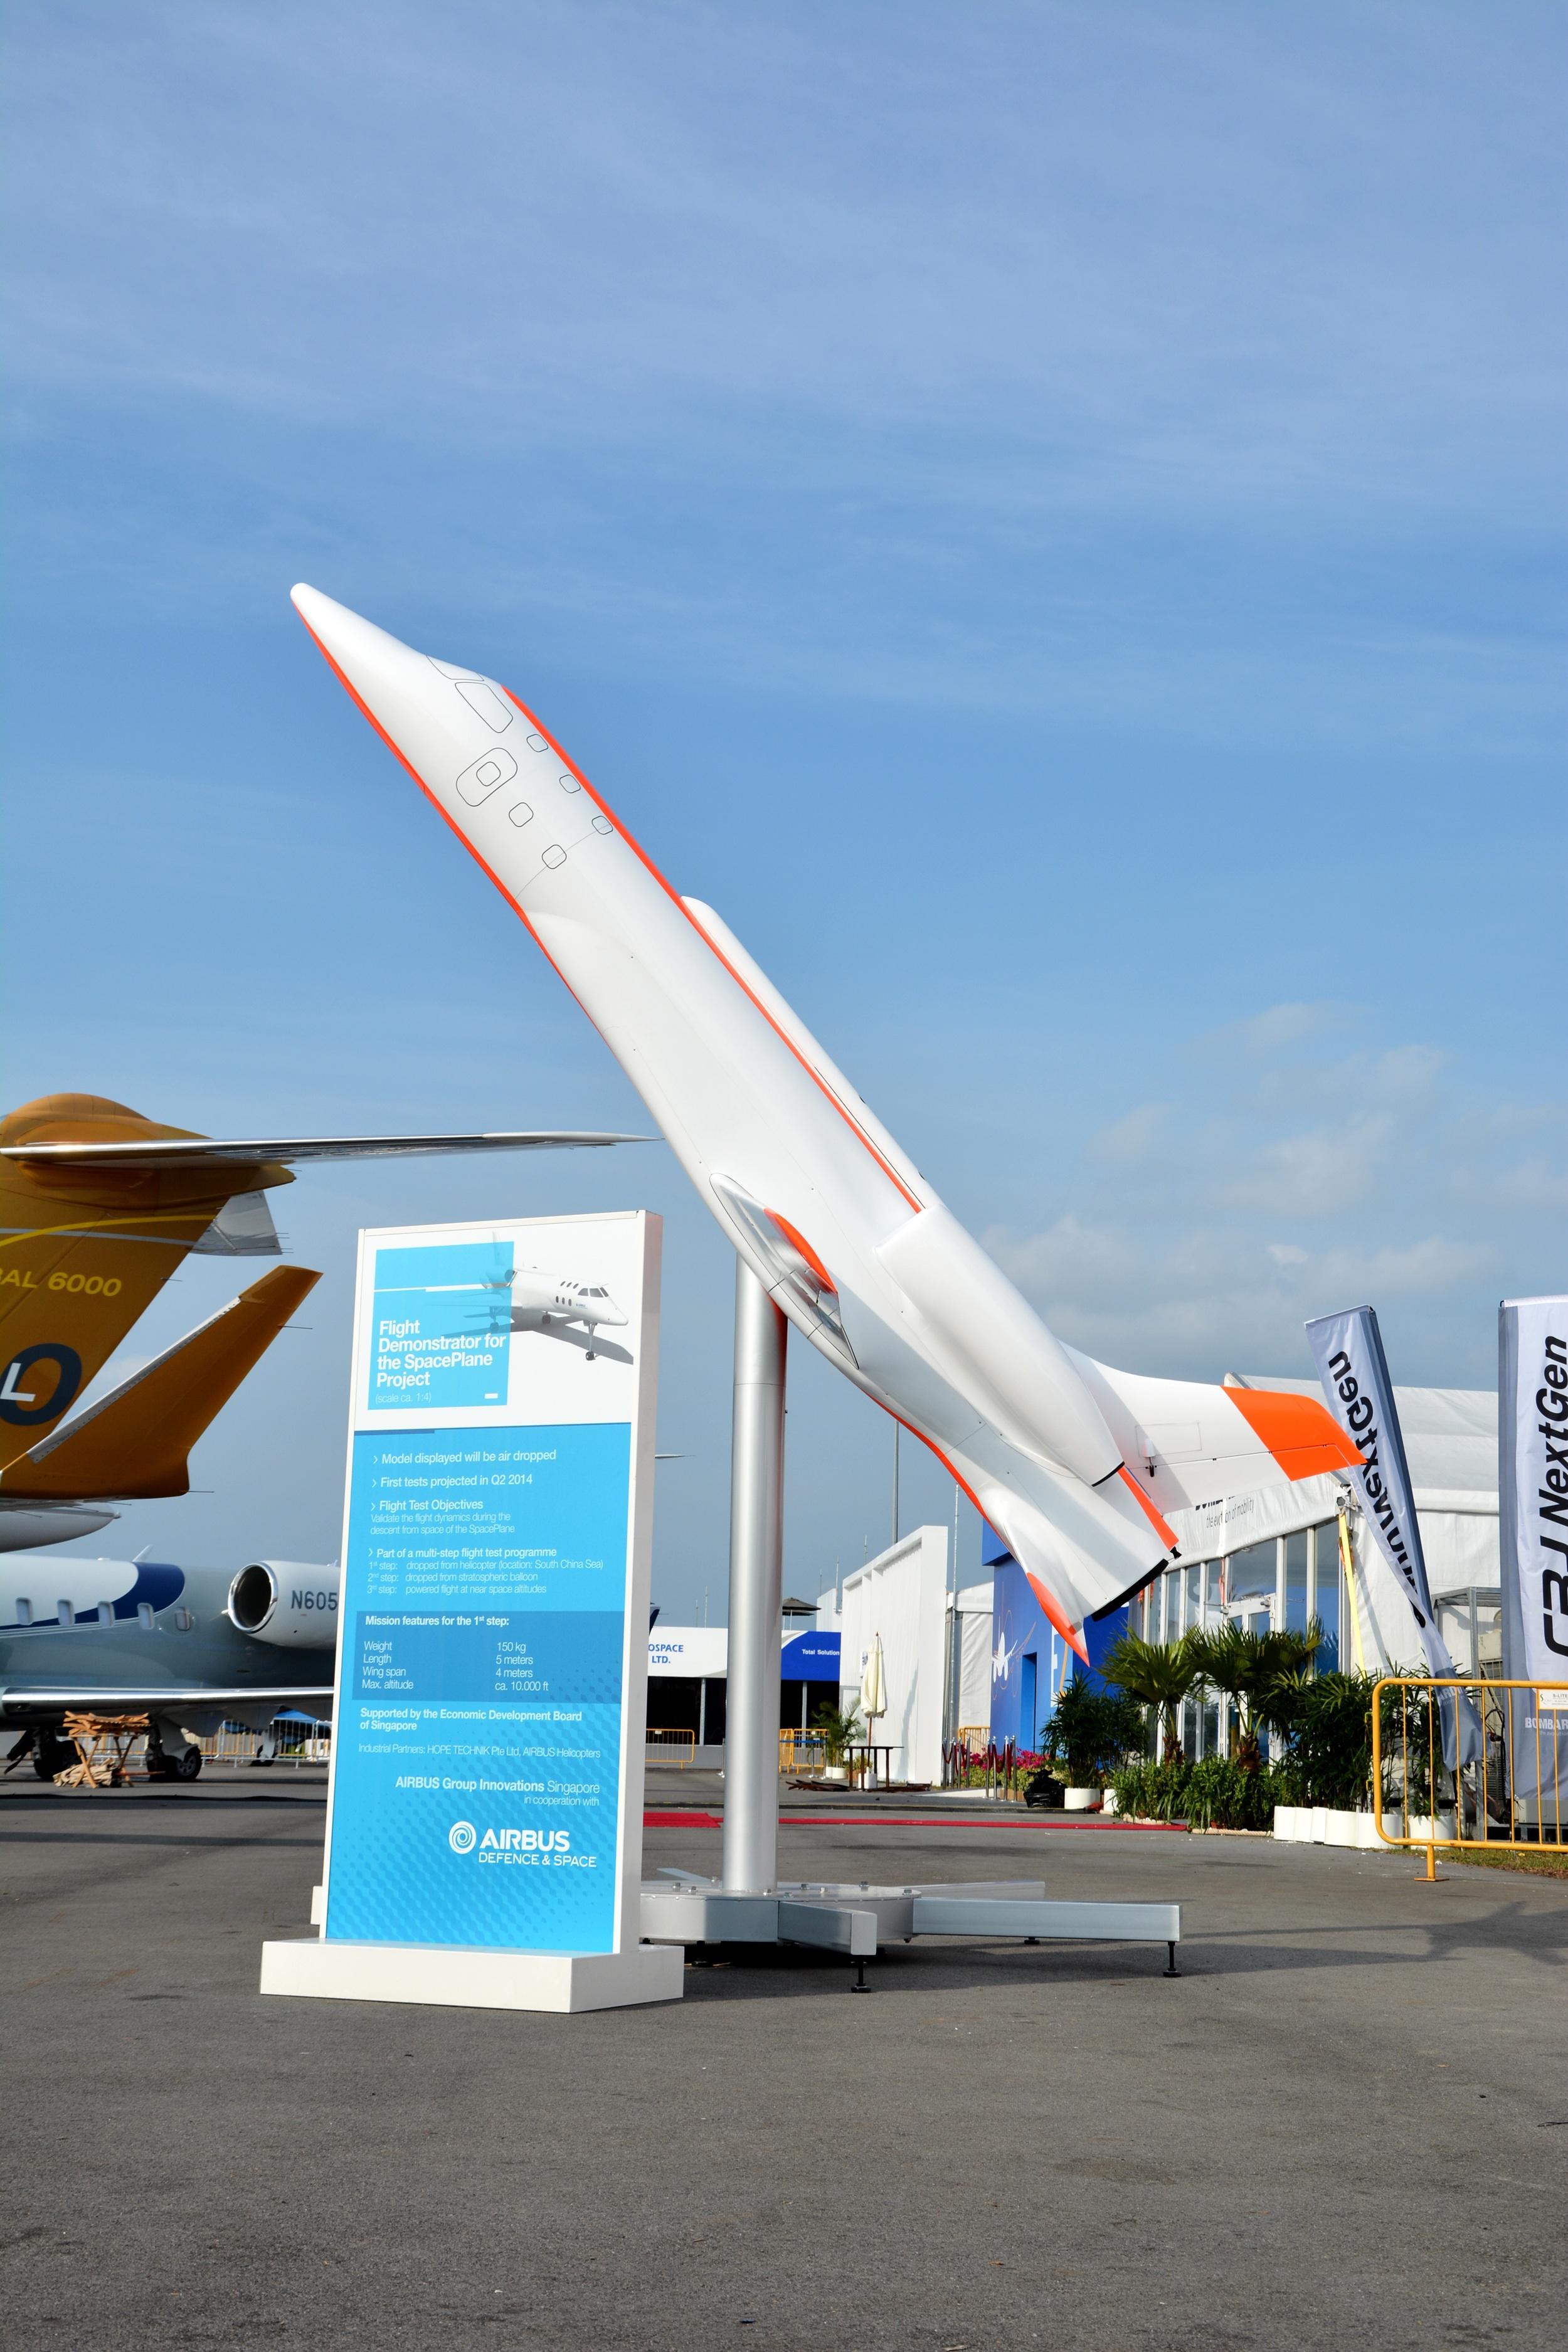 Airbus' Spaceplane Prototype on Display